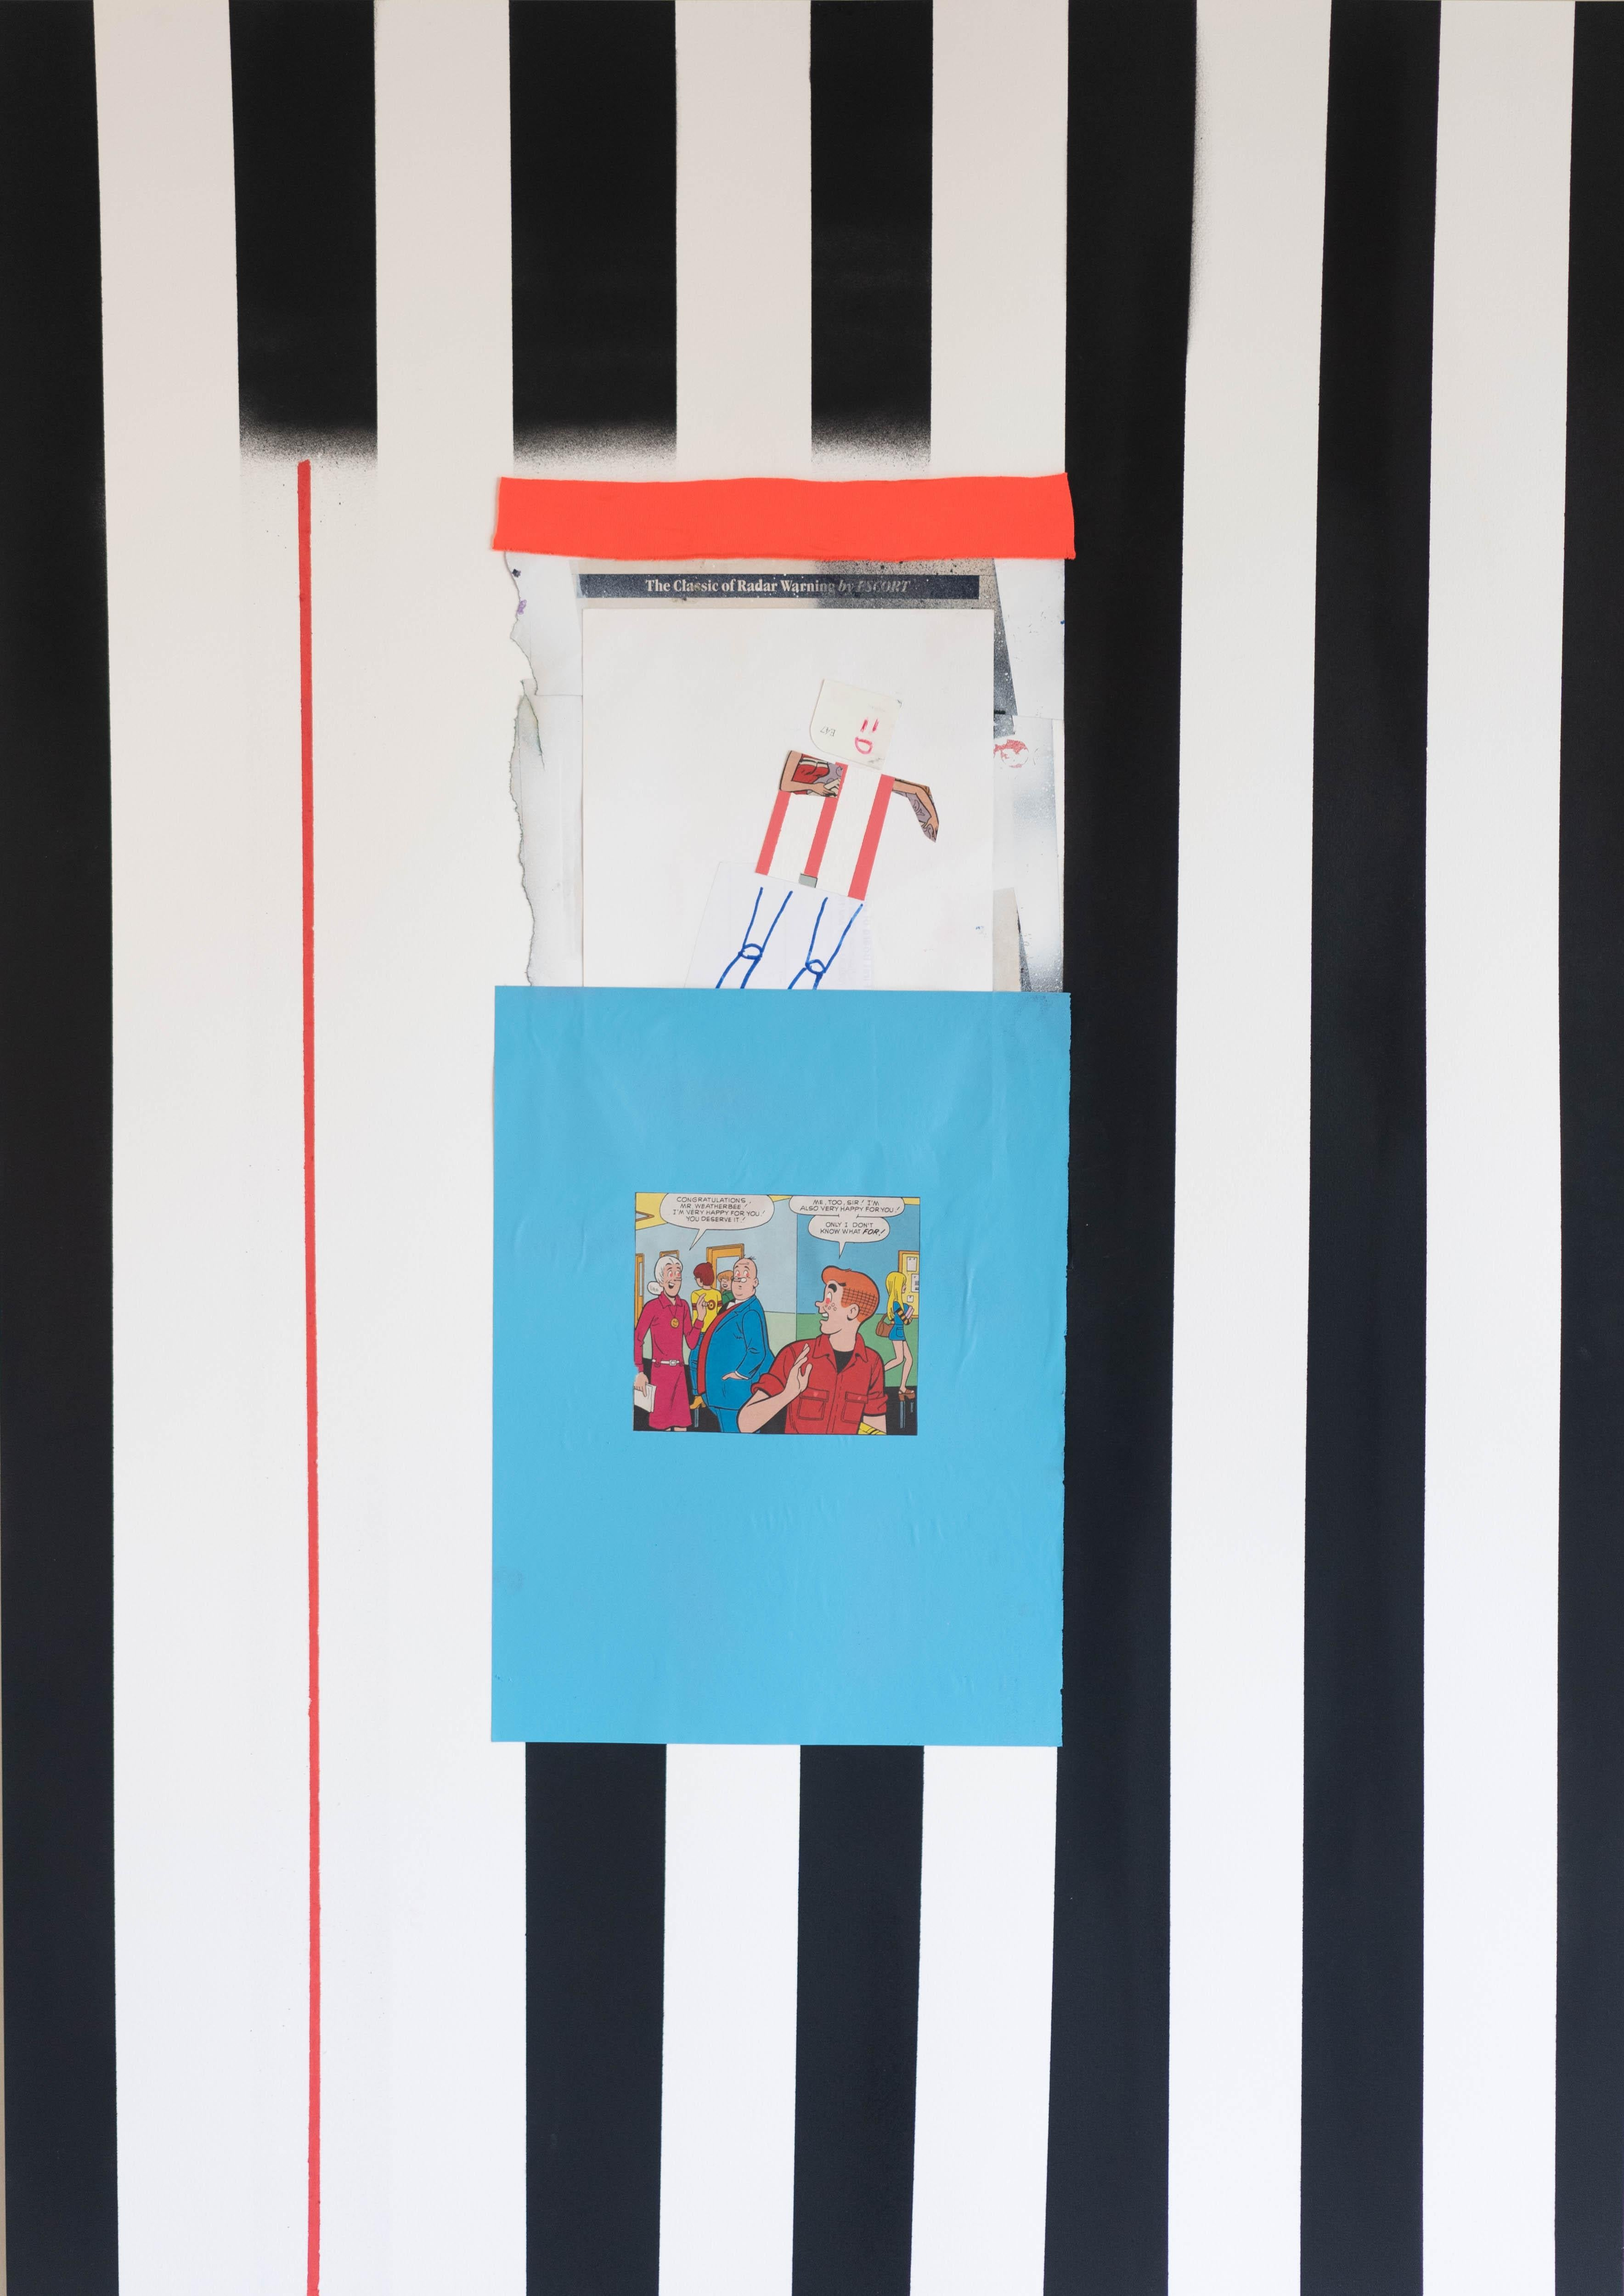 Black Stripe, Acrylic, oil pastel, aerosol, collage on paper, 60 x 84 cm, 2021